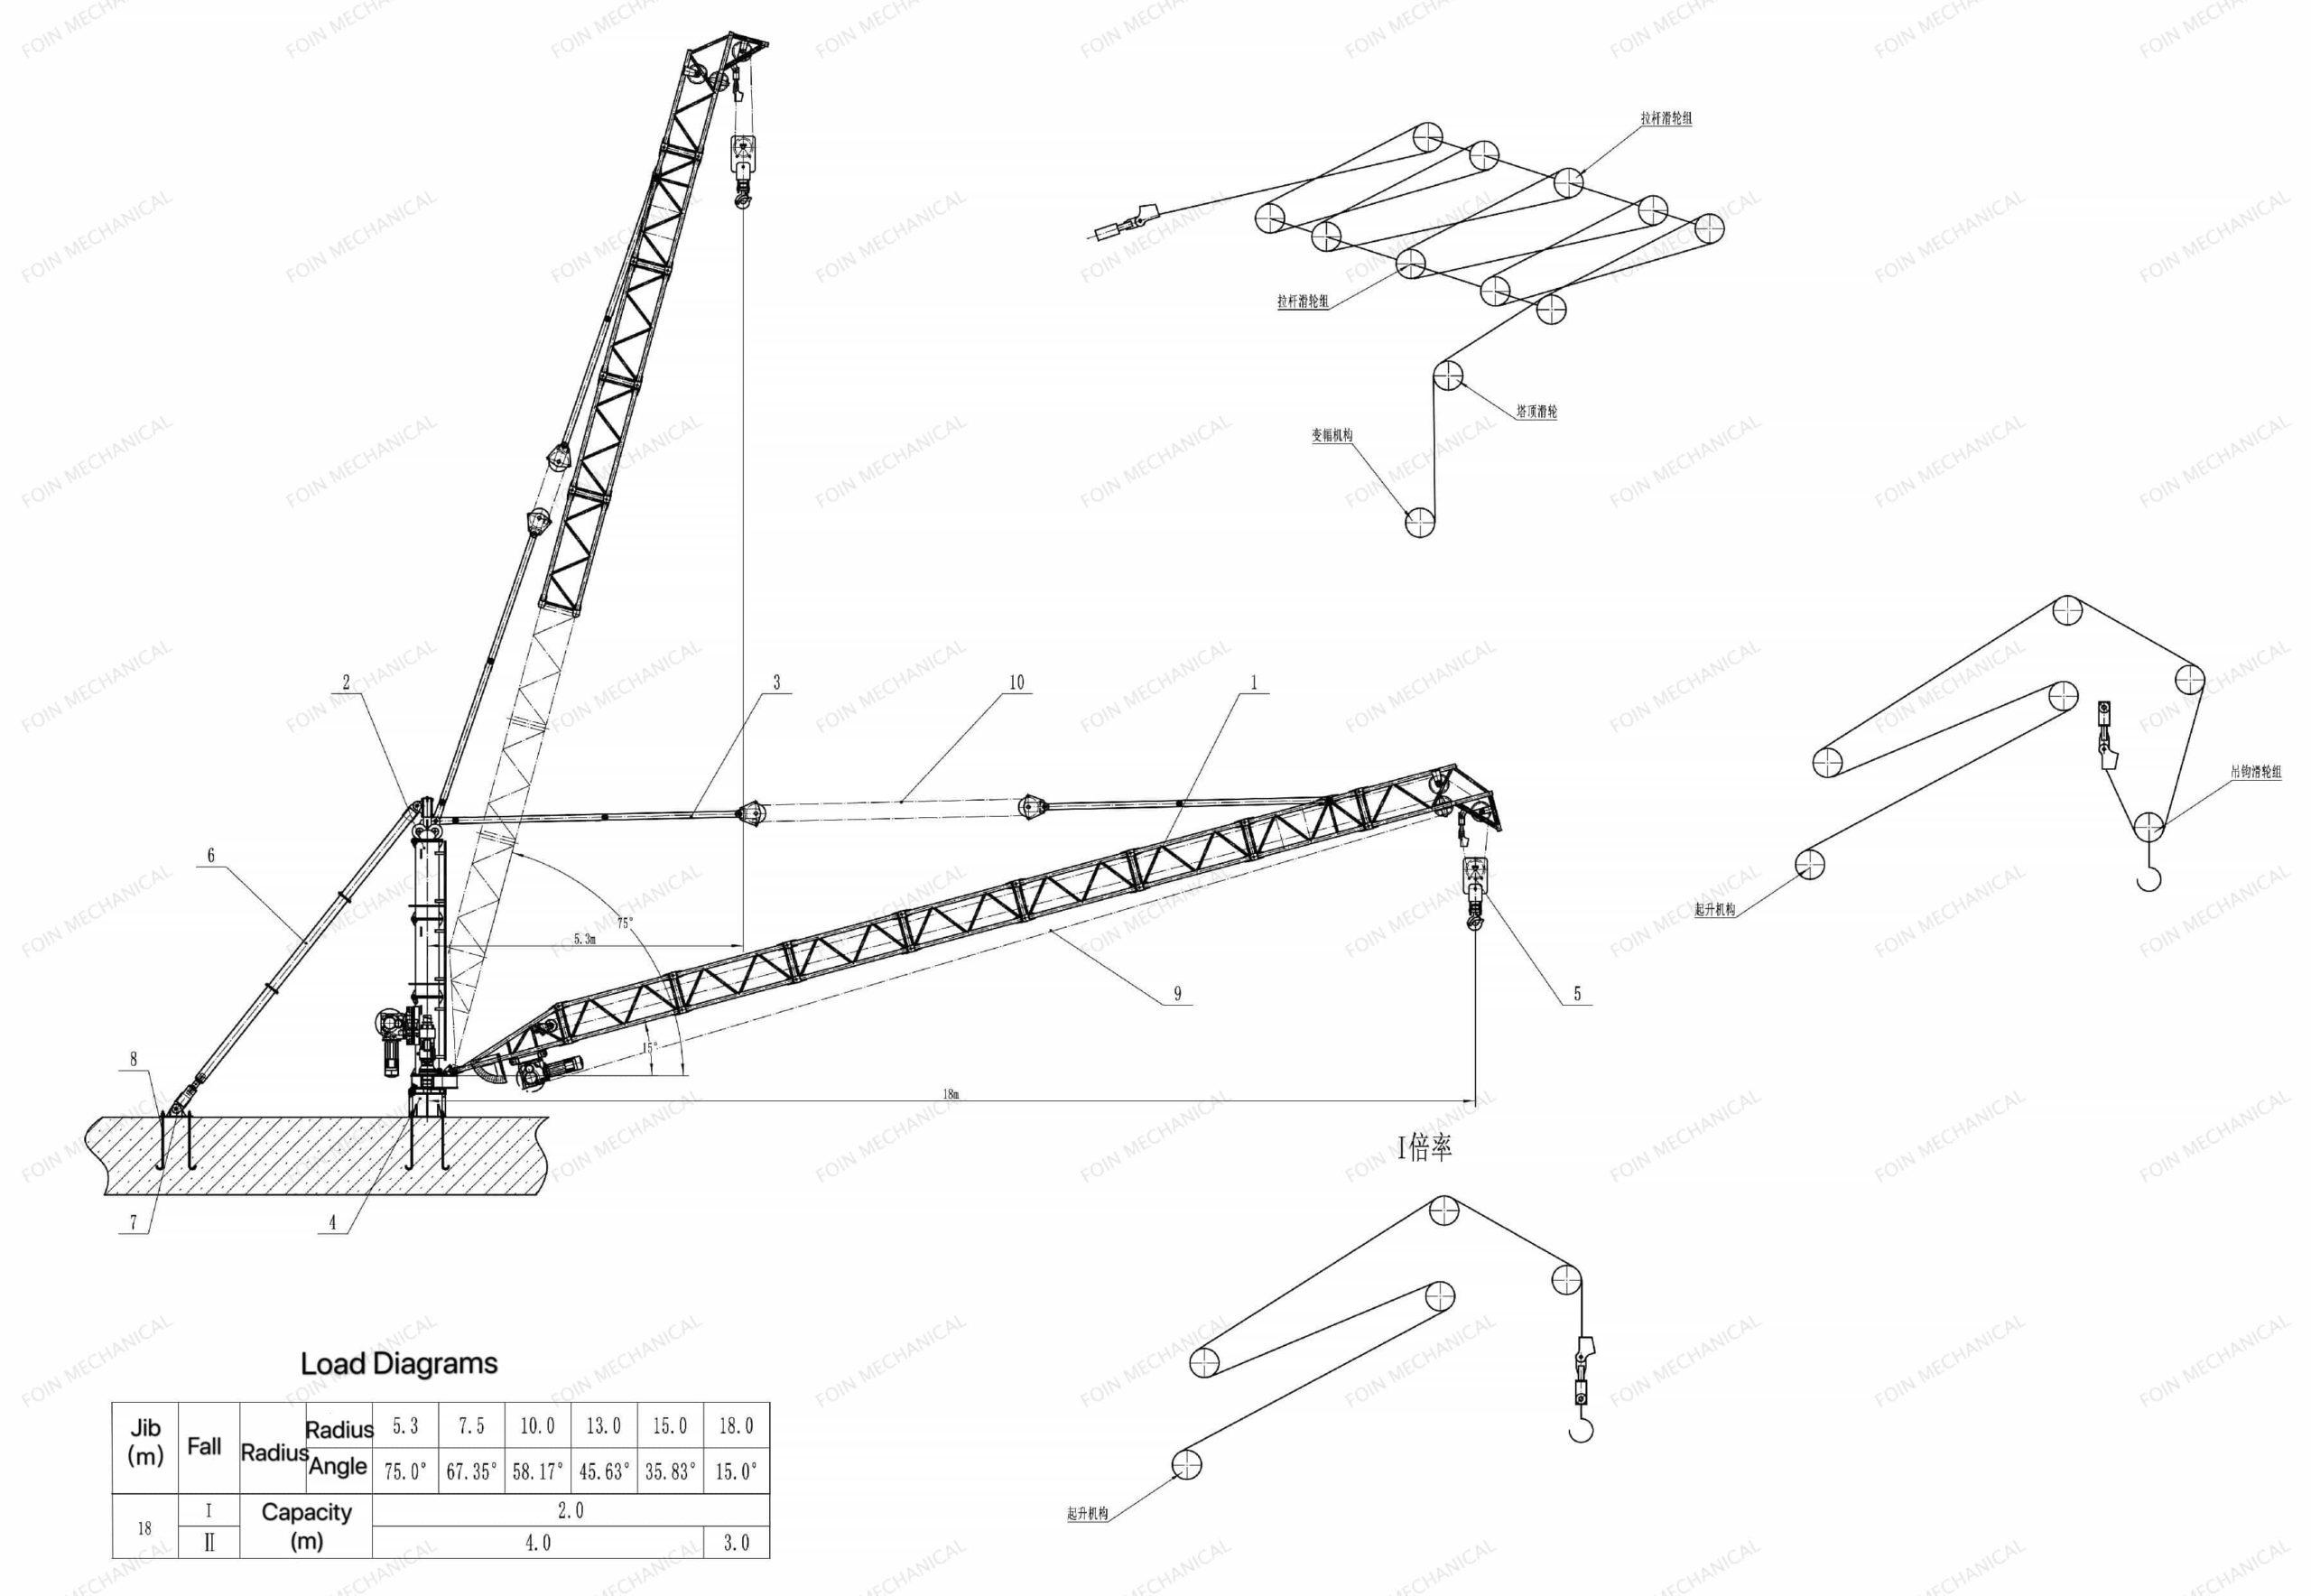 FOIN Derrick Crane/Jib Pole/Stiff Leg Derrick DC1830